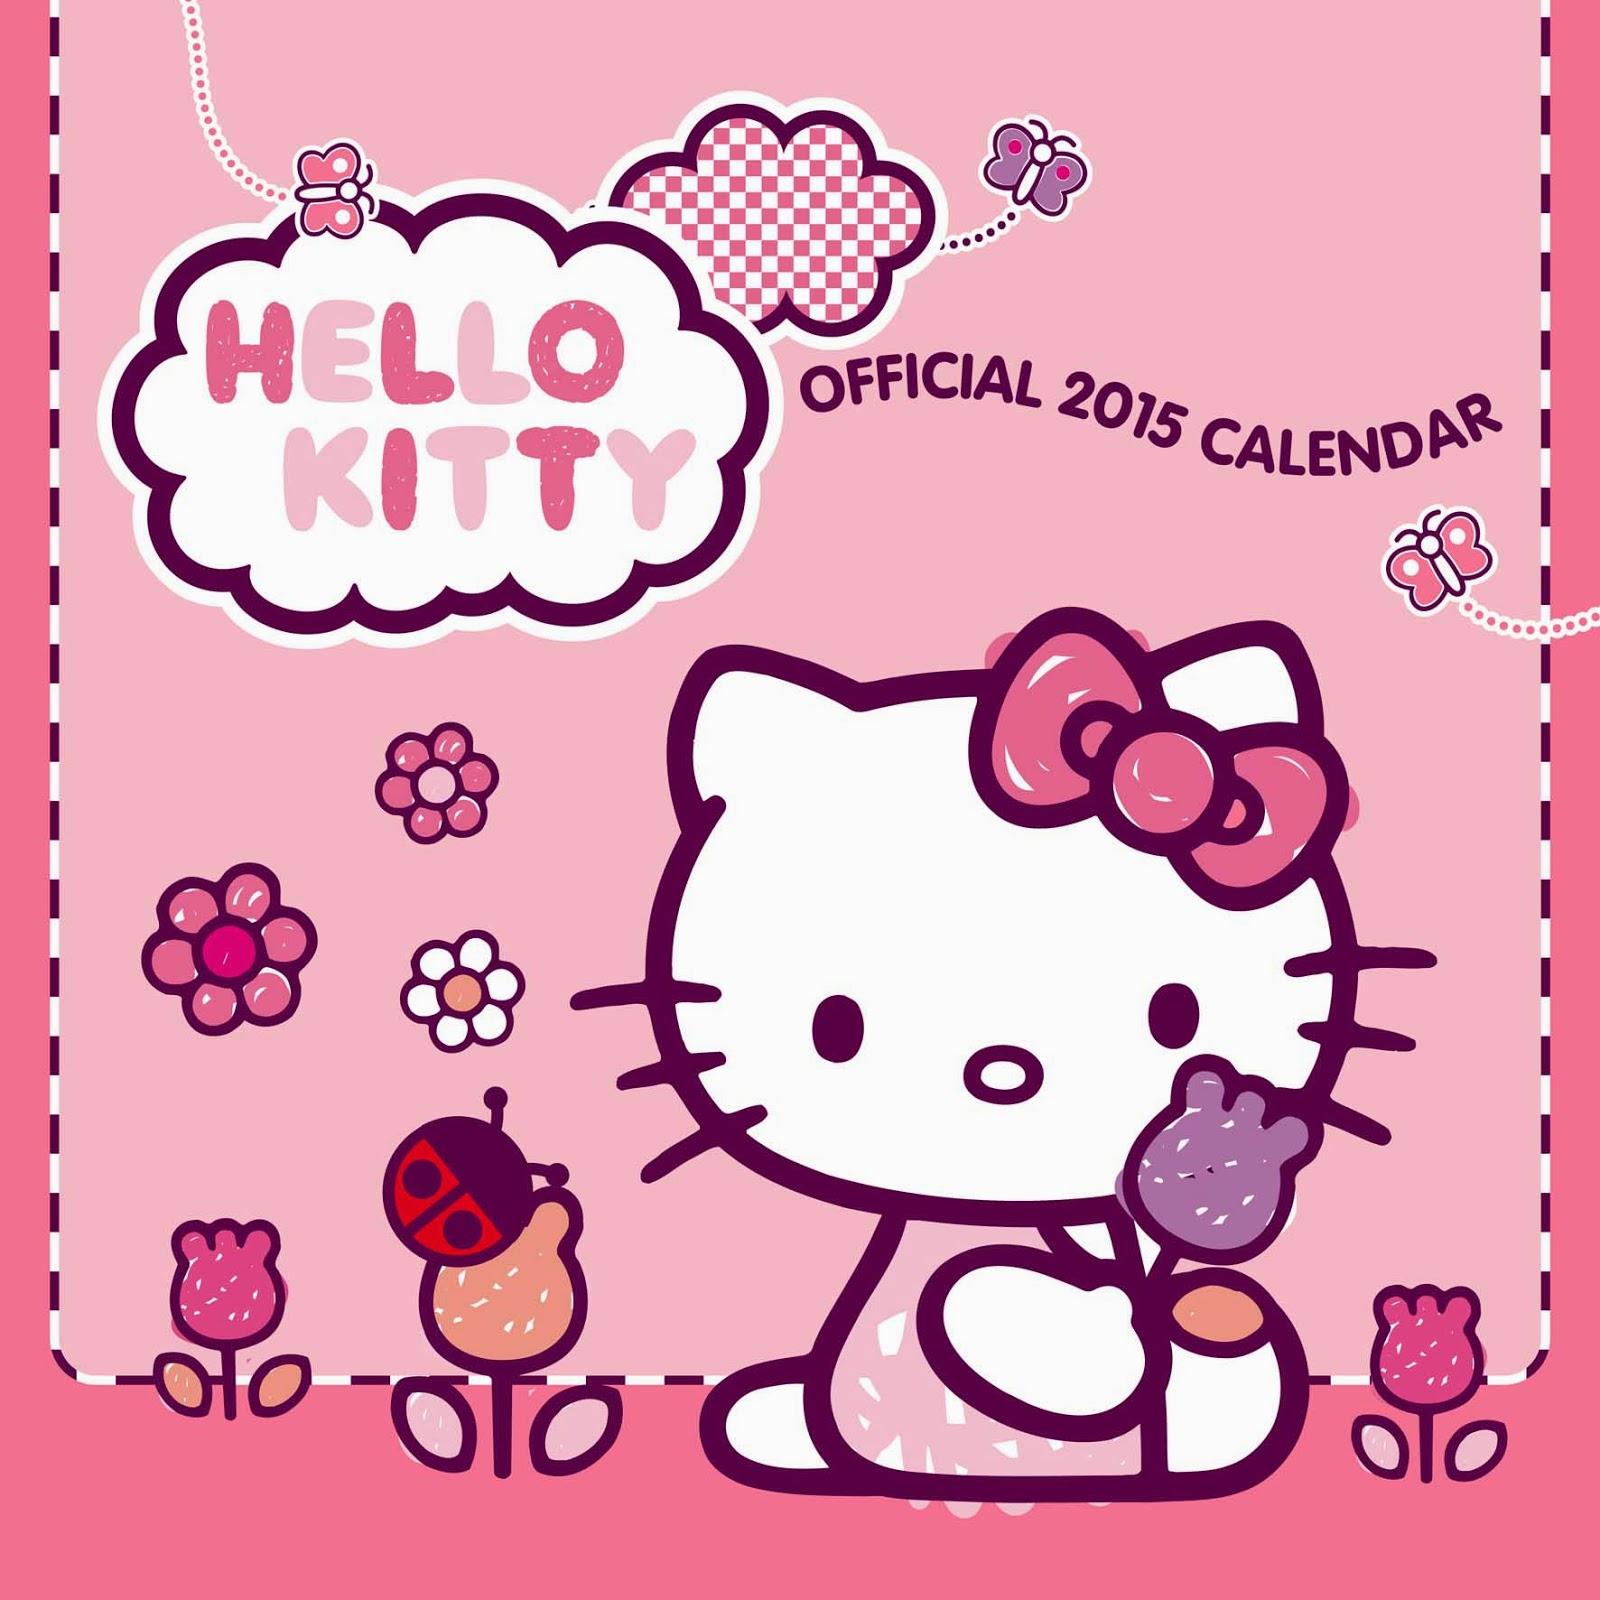 Hello Kitty Pink Cute Wallpaper Bergerak Gambar Hello Kitty 2015 Wallpaper Lucu Gambar Hello